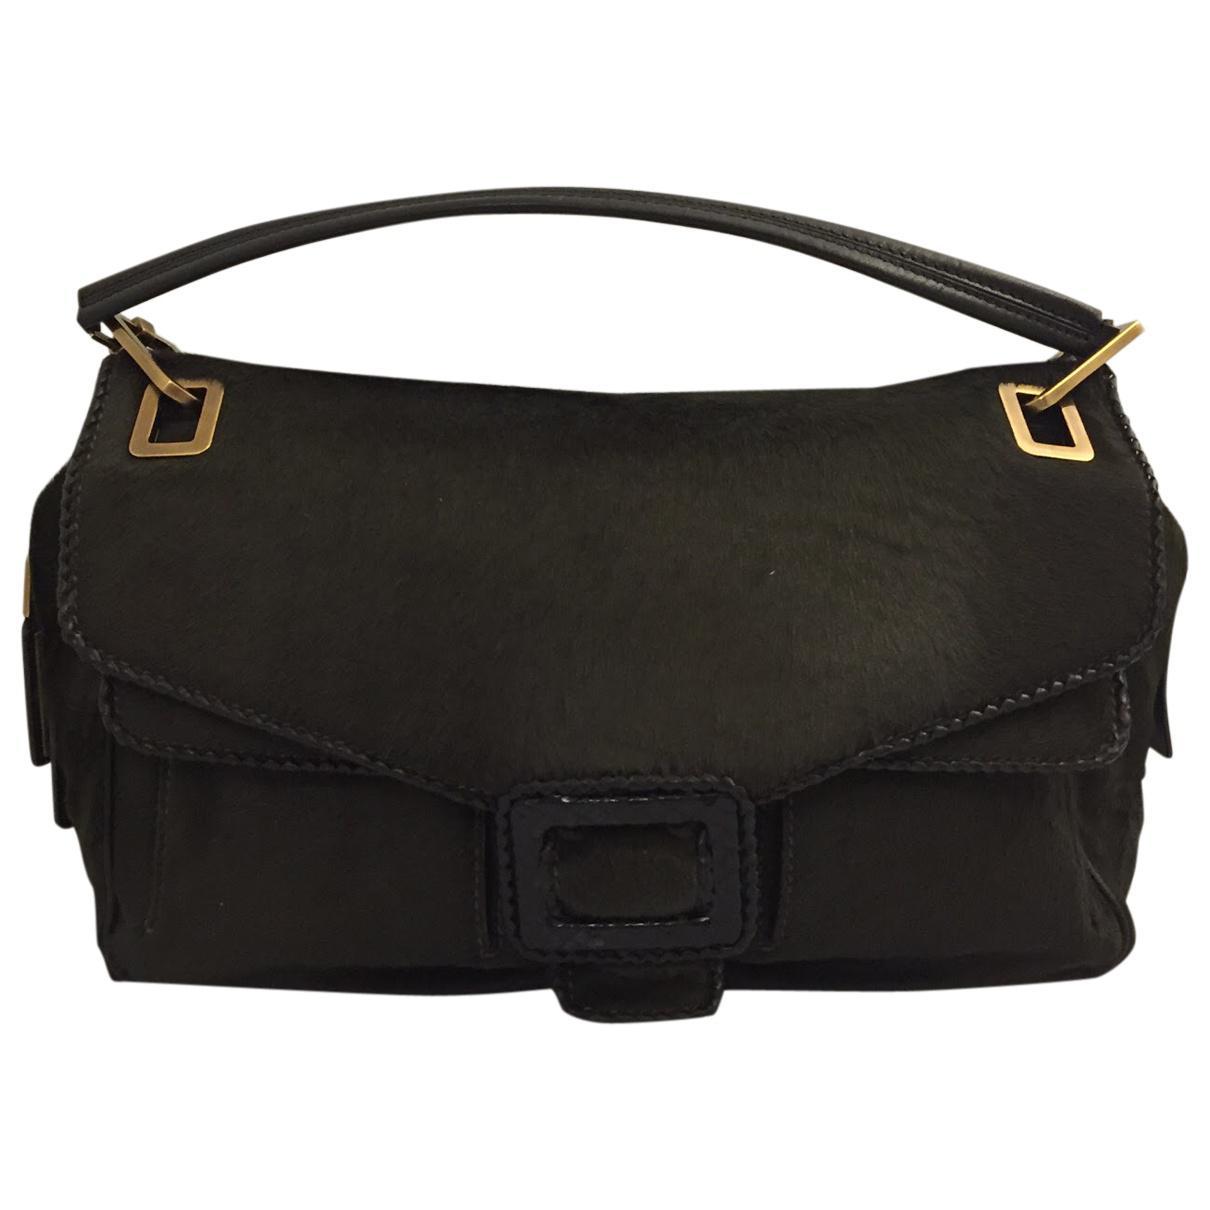 3d4d56fb0297 Lyst - Roger Vivier Pony-style Calfskin Handbag in Black